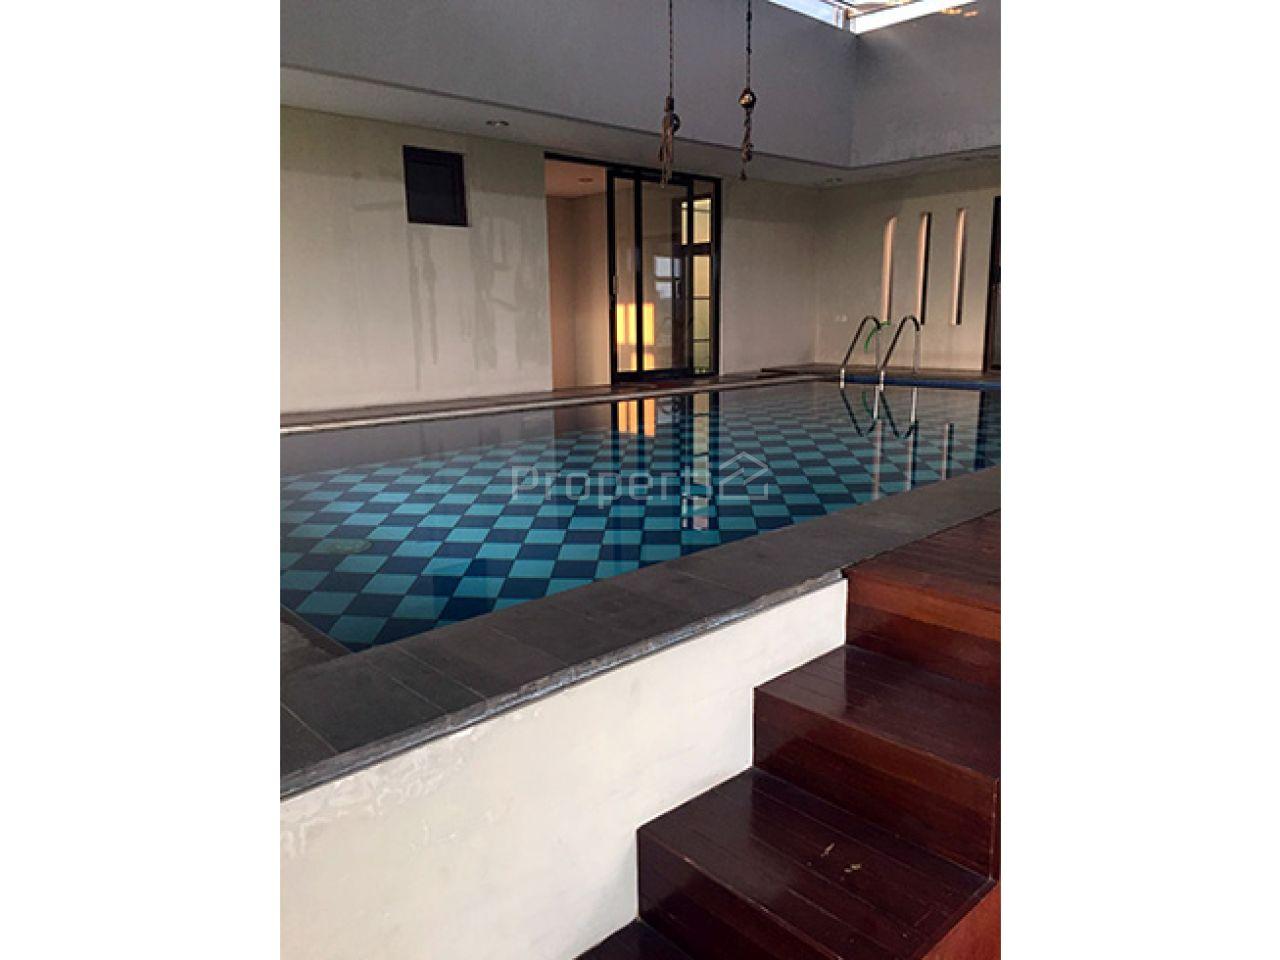 2-Storey House Equipped with a Pool in Kuldesak Neighborhood, Sukasari